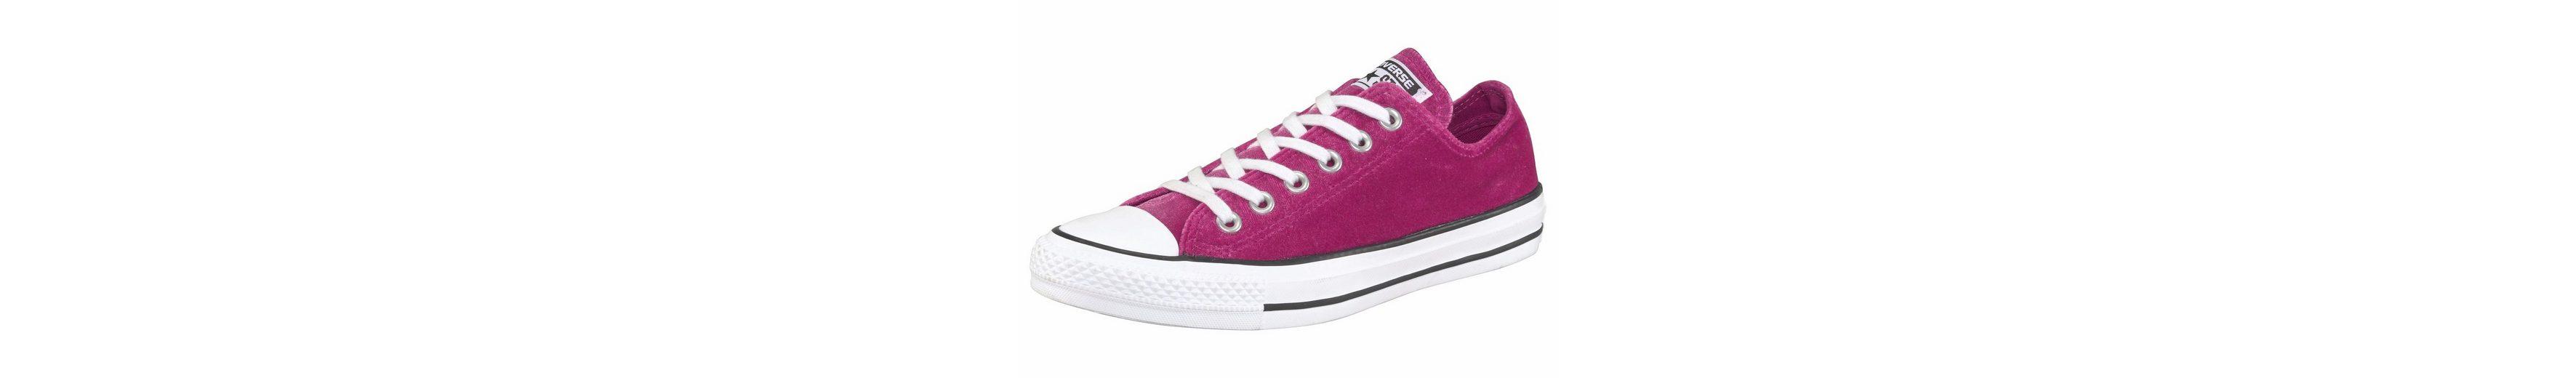 Converse Chuck Taylor All Star Ox Sneaker, Samt